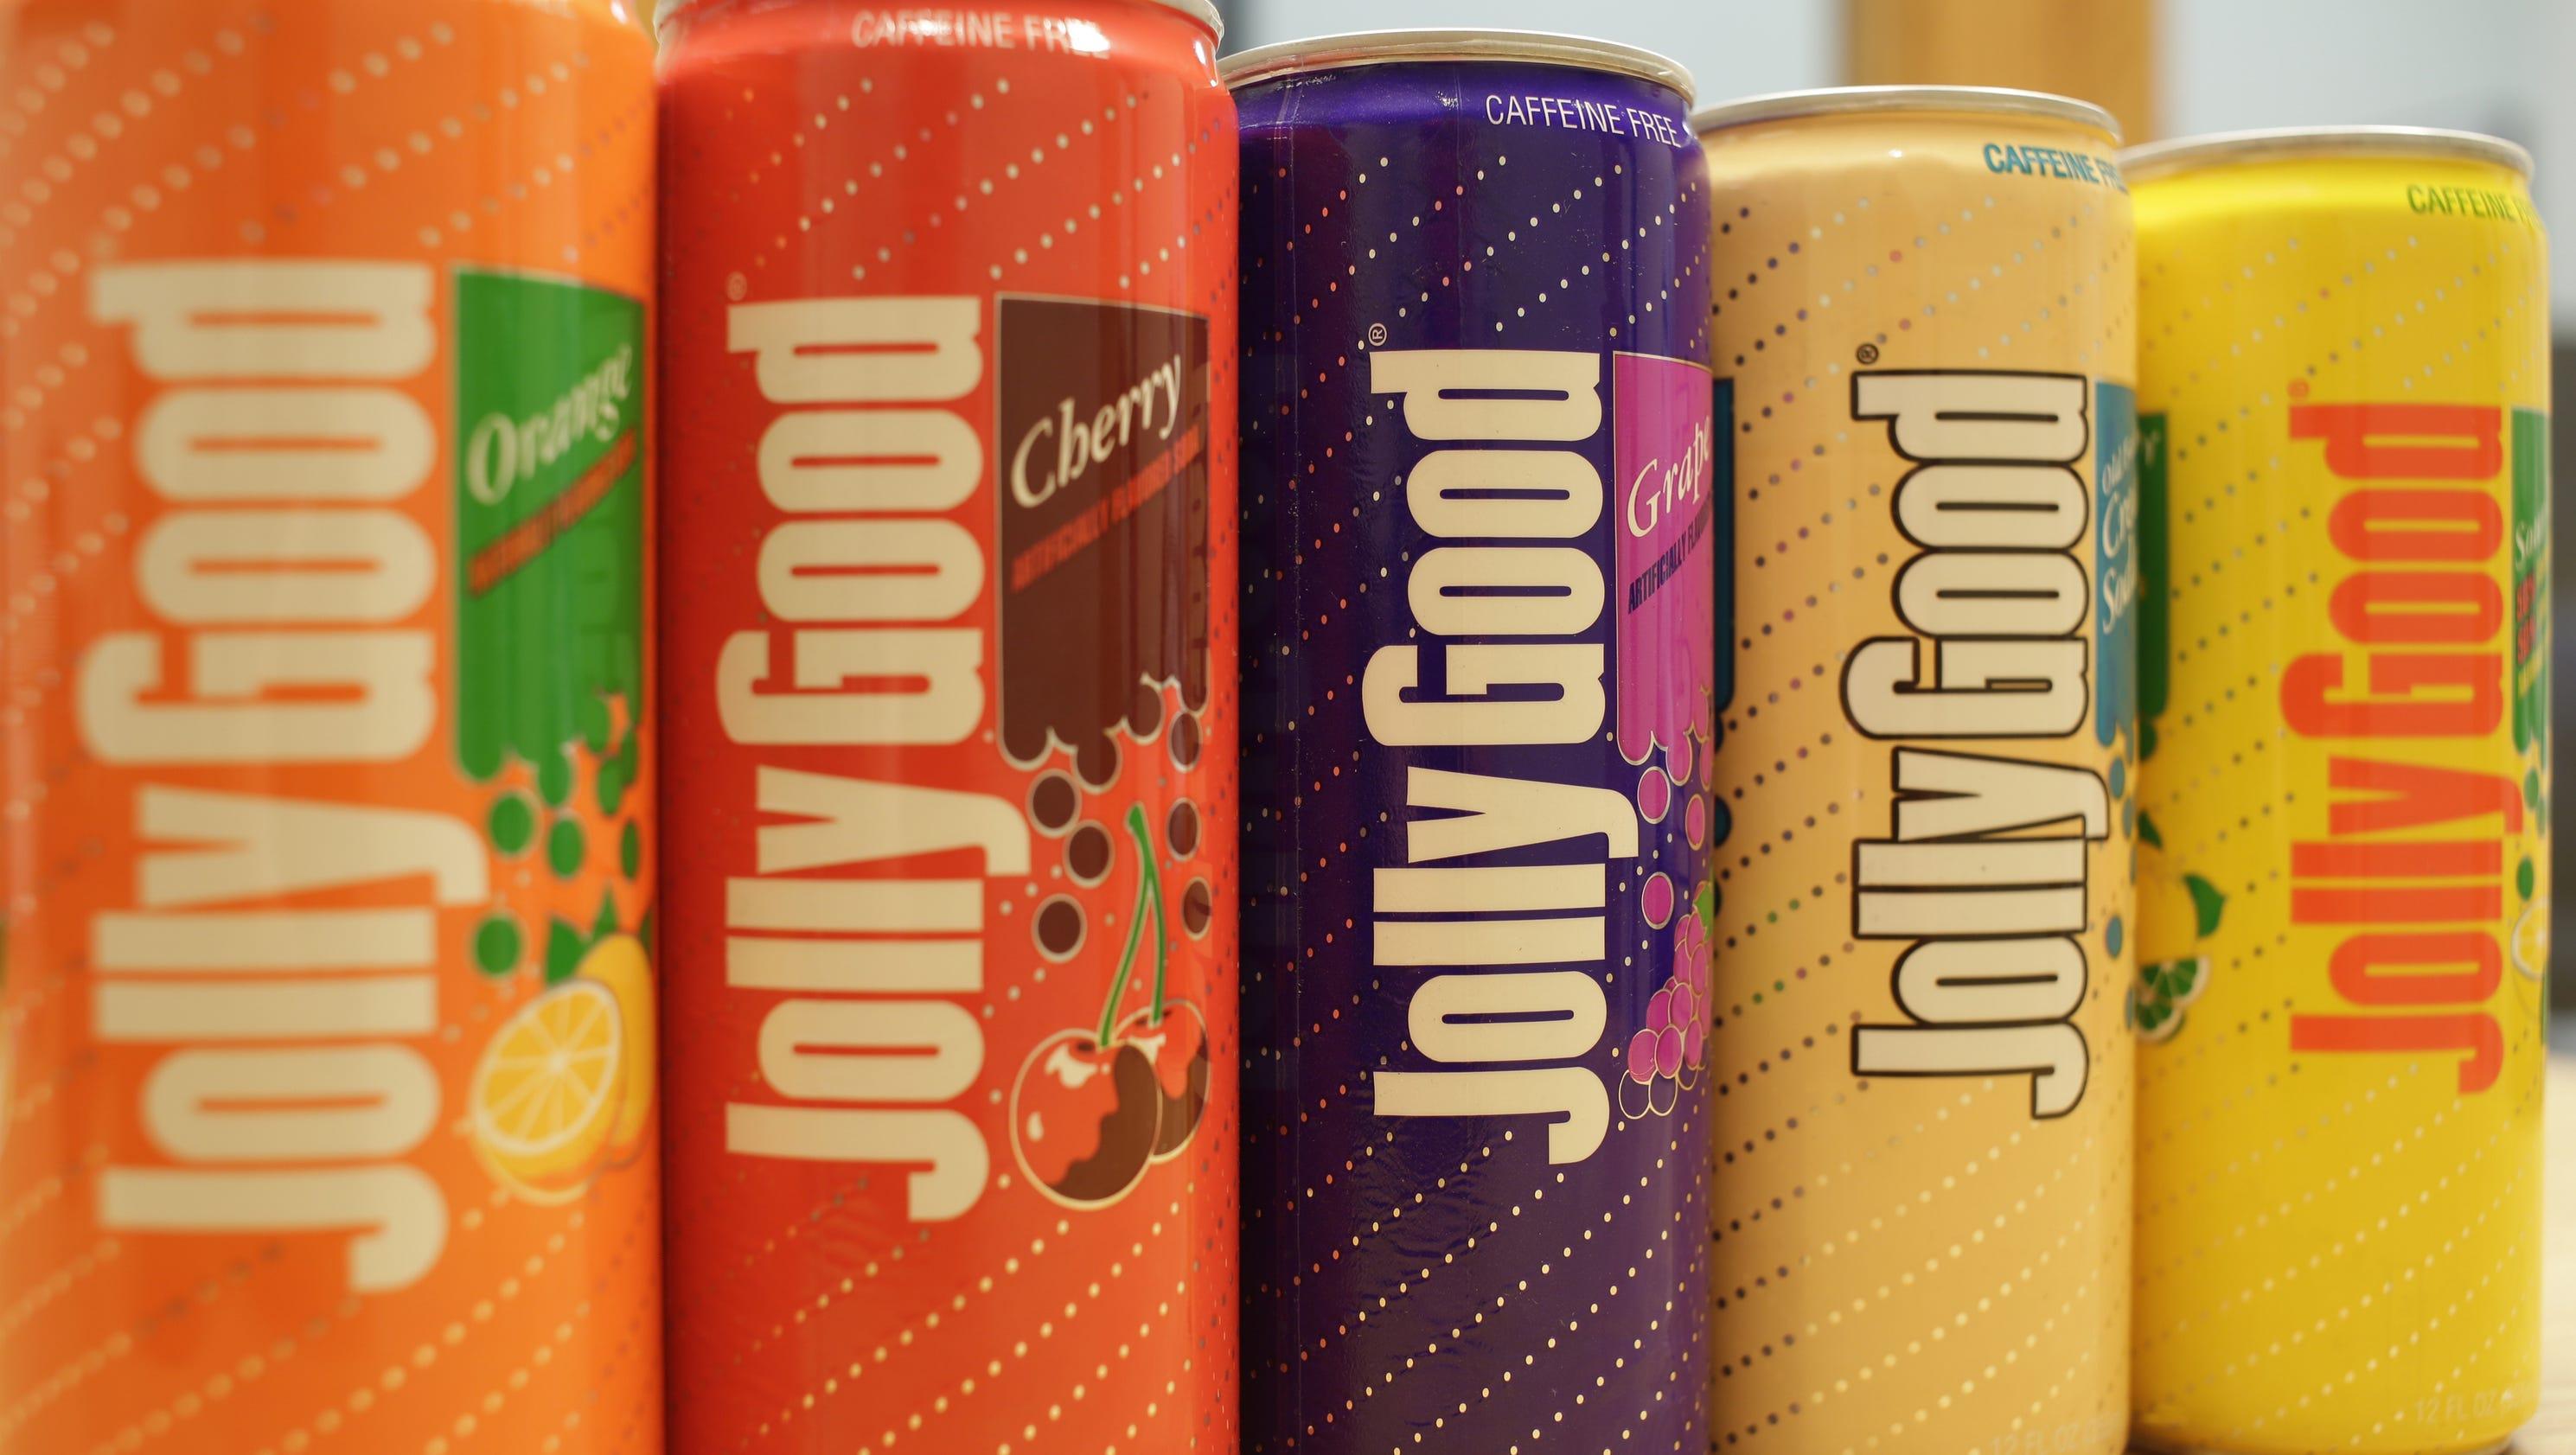 Sheboygan County Firm Revives Jolly Good Soda